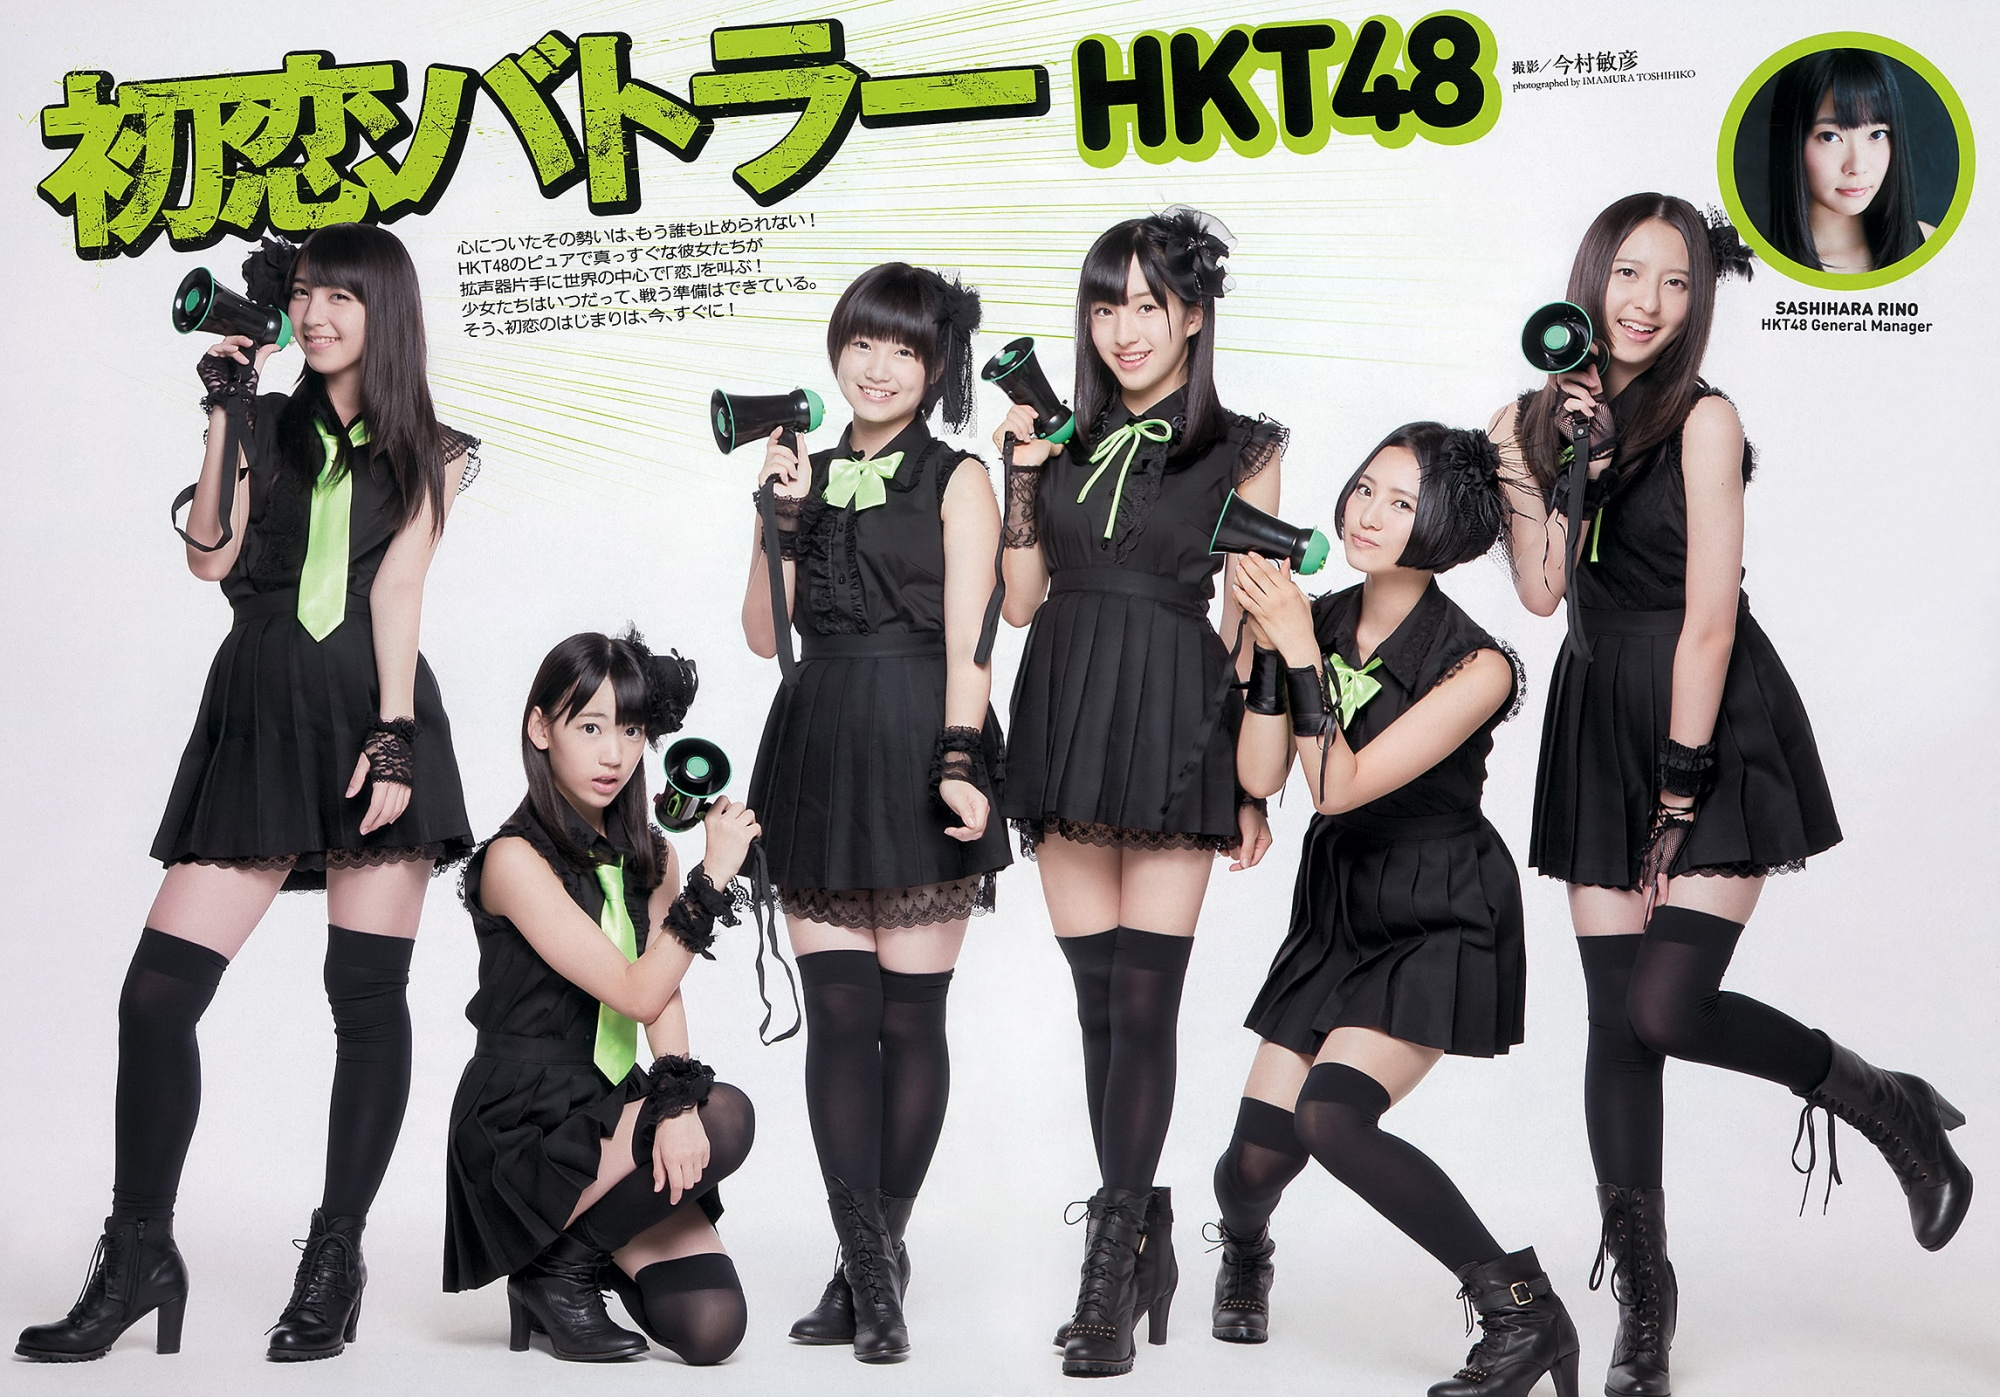 Hkt48 40094 Asiachan